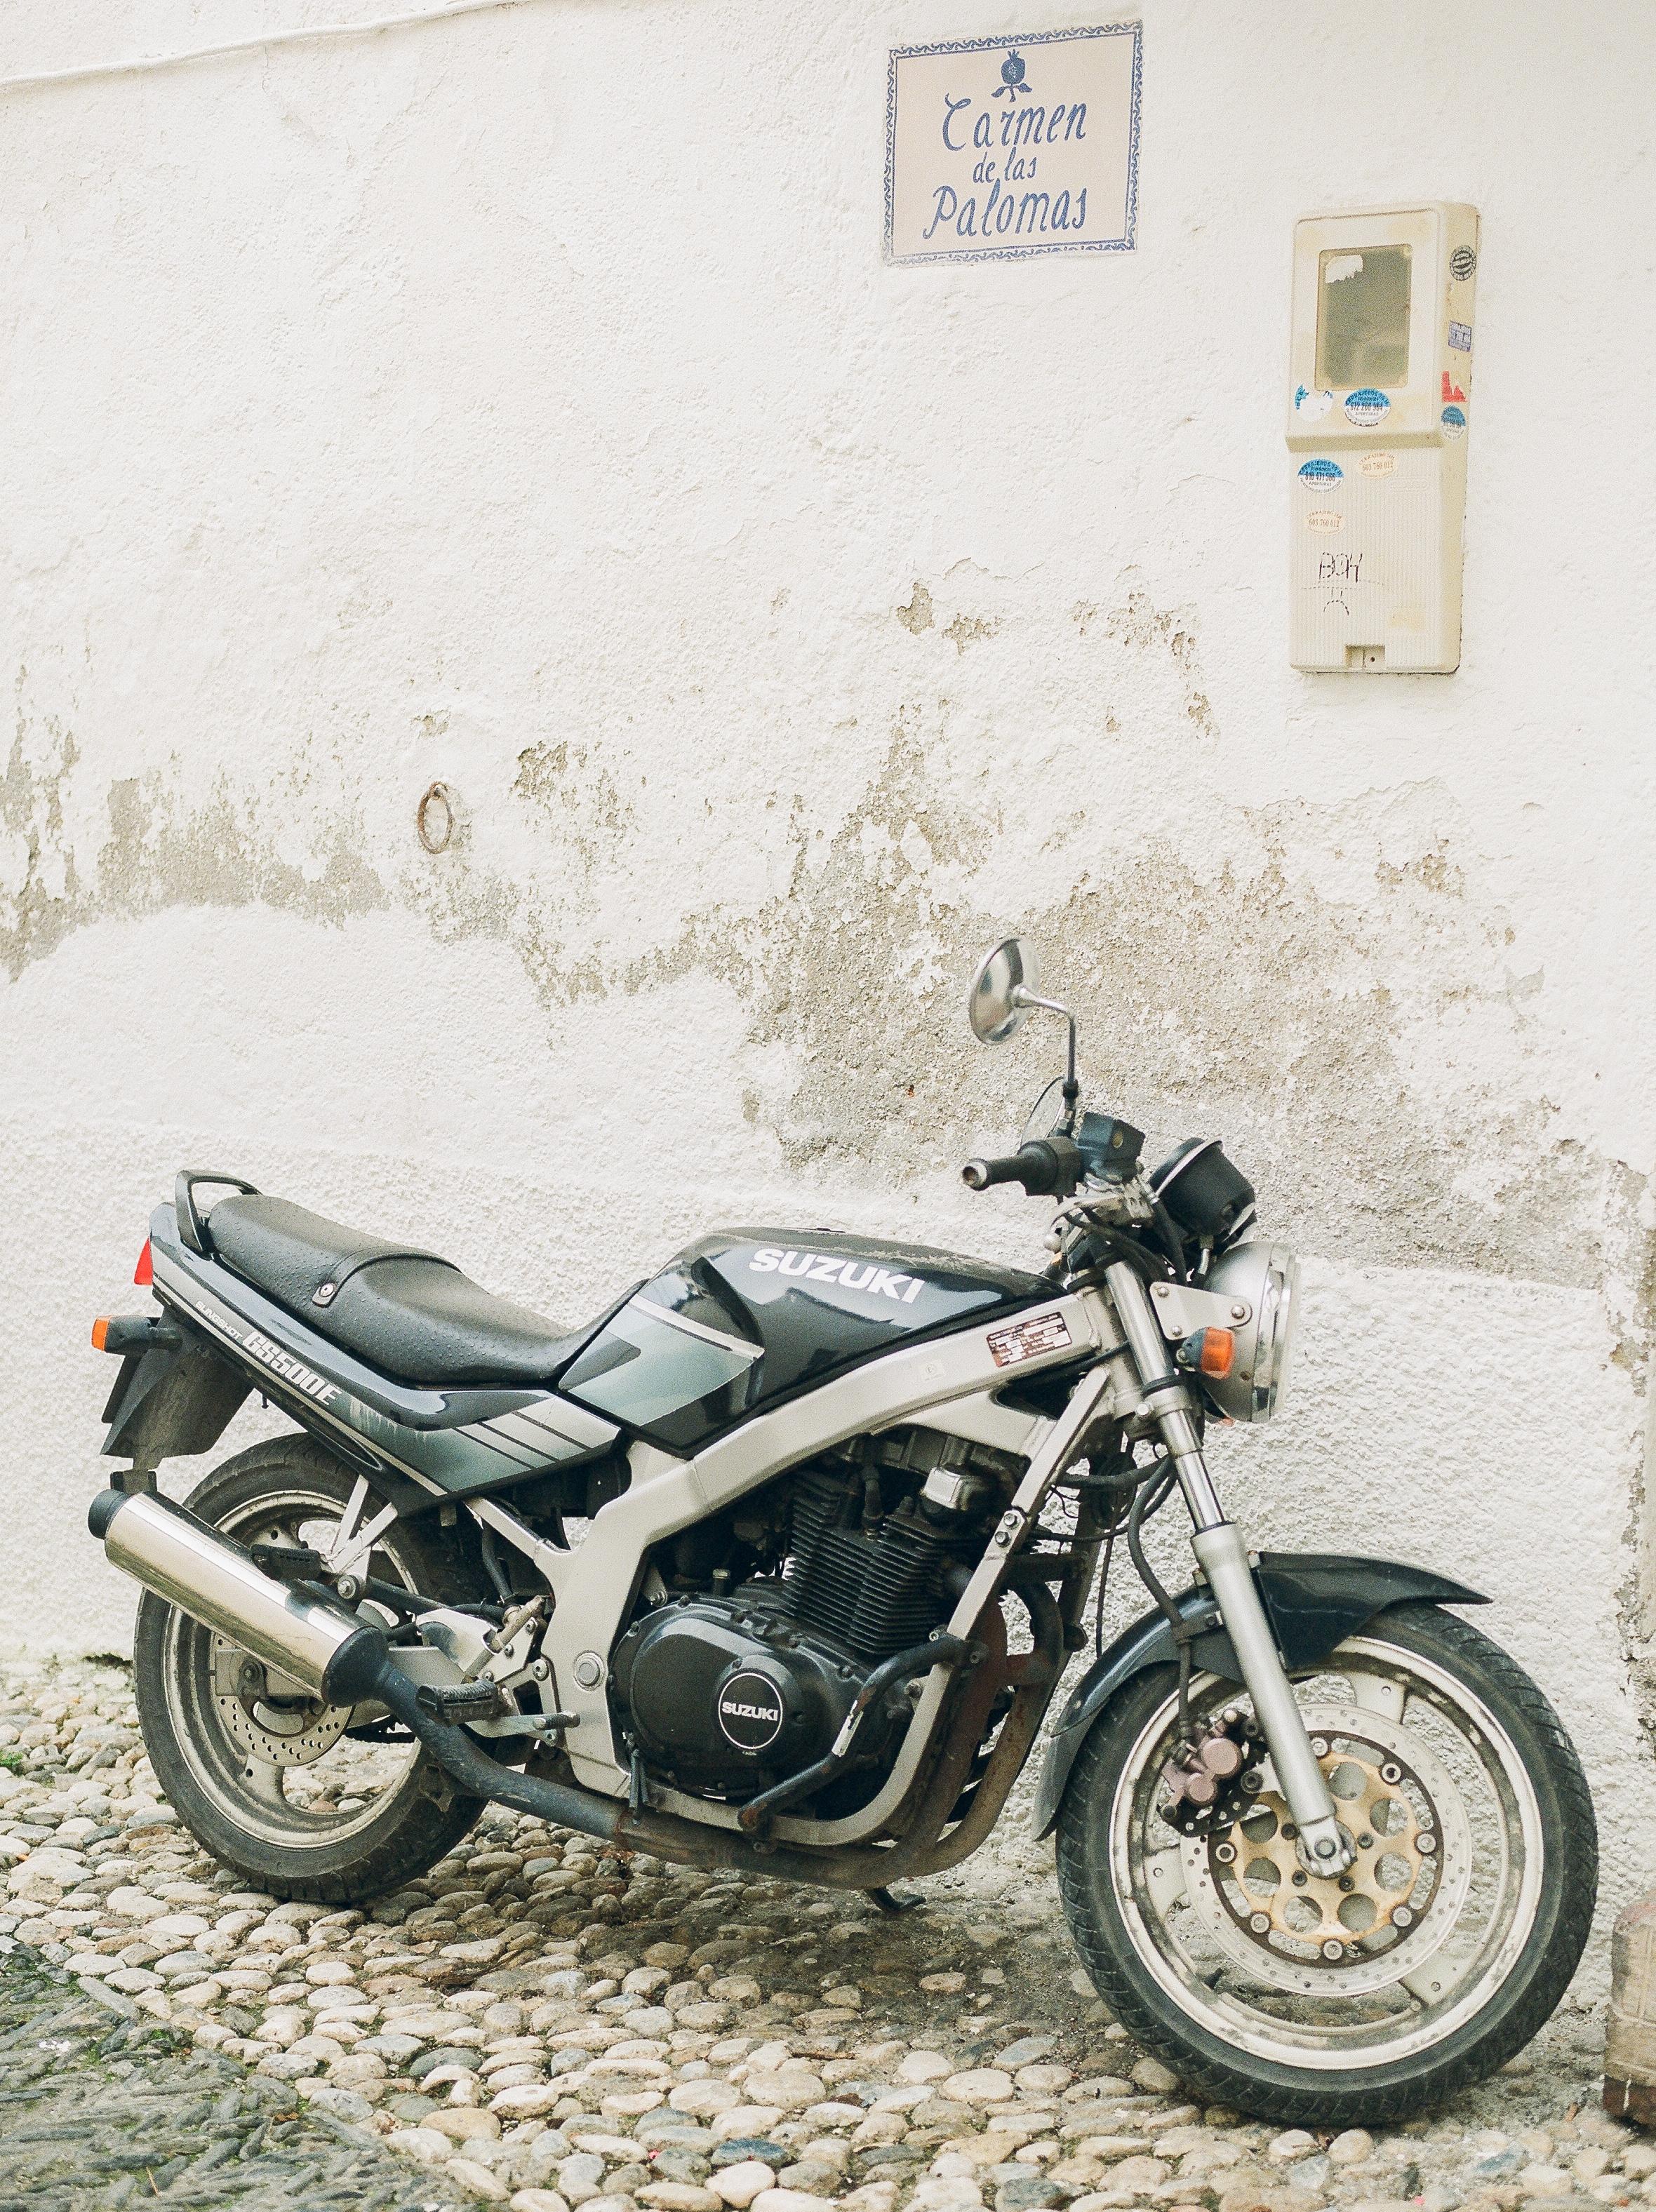 Destination-Barcelona-Motorcycle-on-the-strets-Photographer-152.jpg